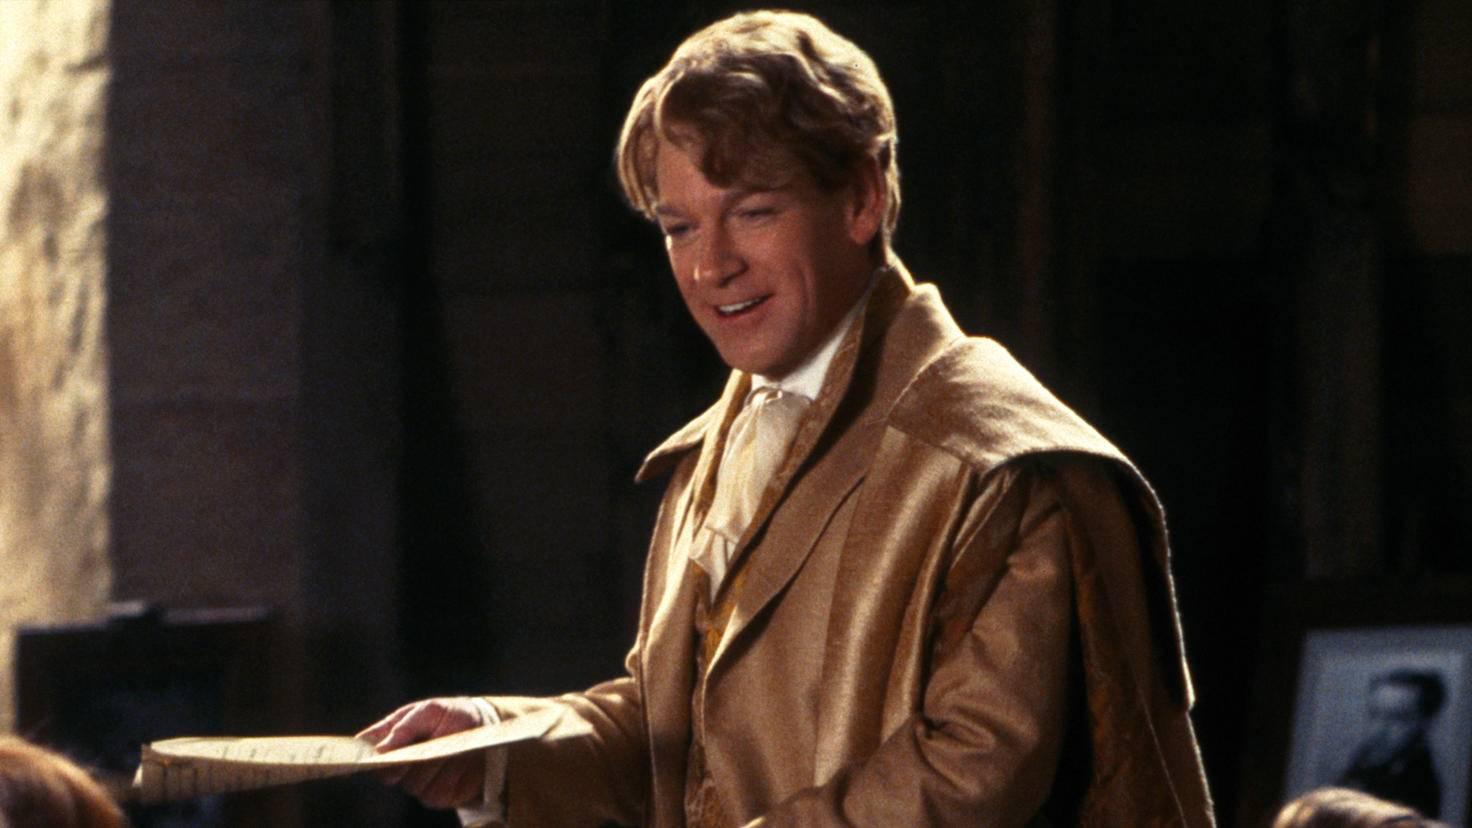 Harry Potter Kenneth Branagh Gilderoy Lockhart